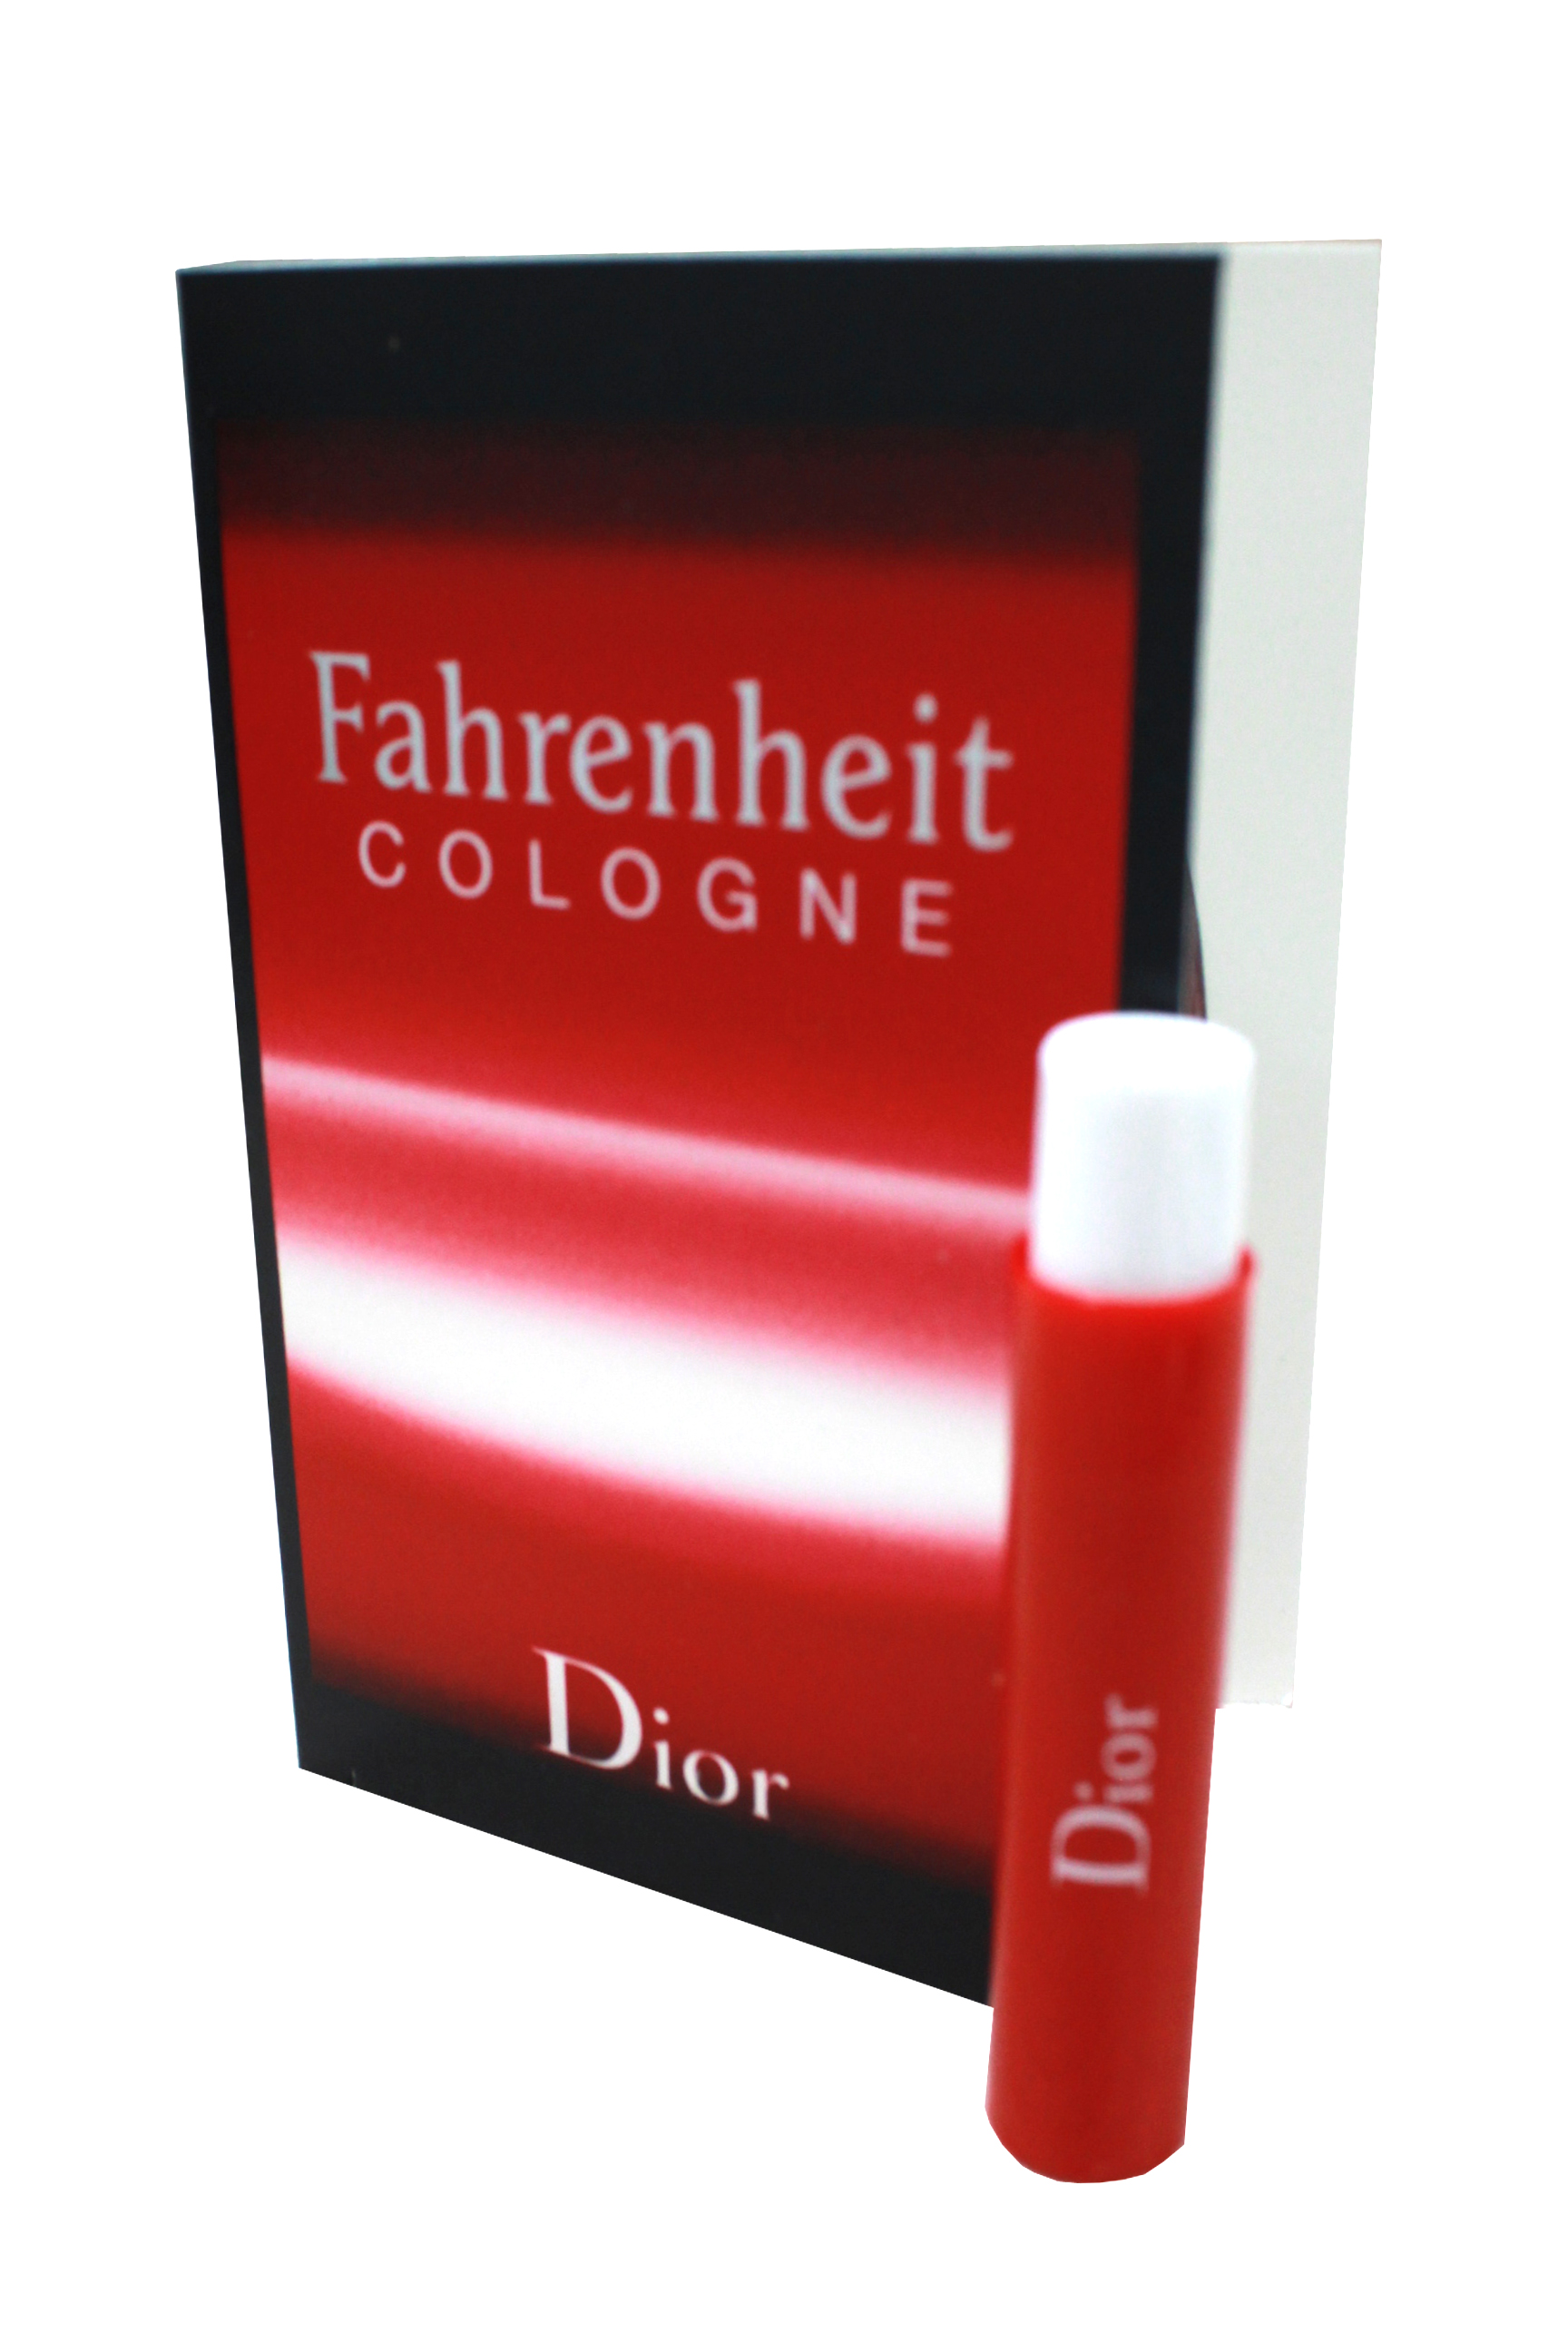 Christian Dior Fahrenheit Cologne M EDC 1ml